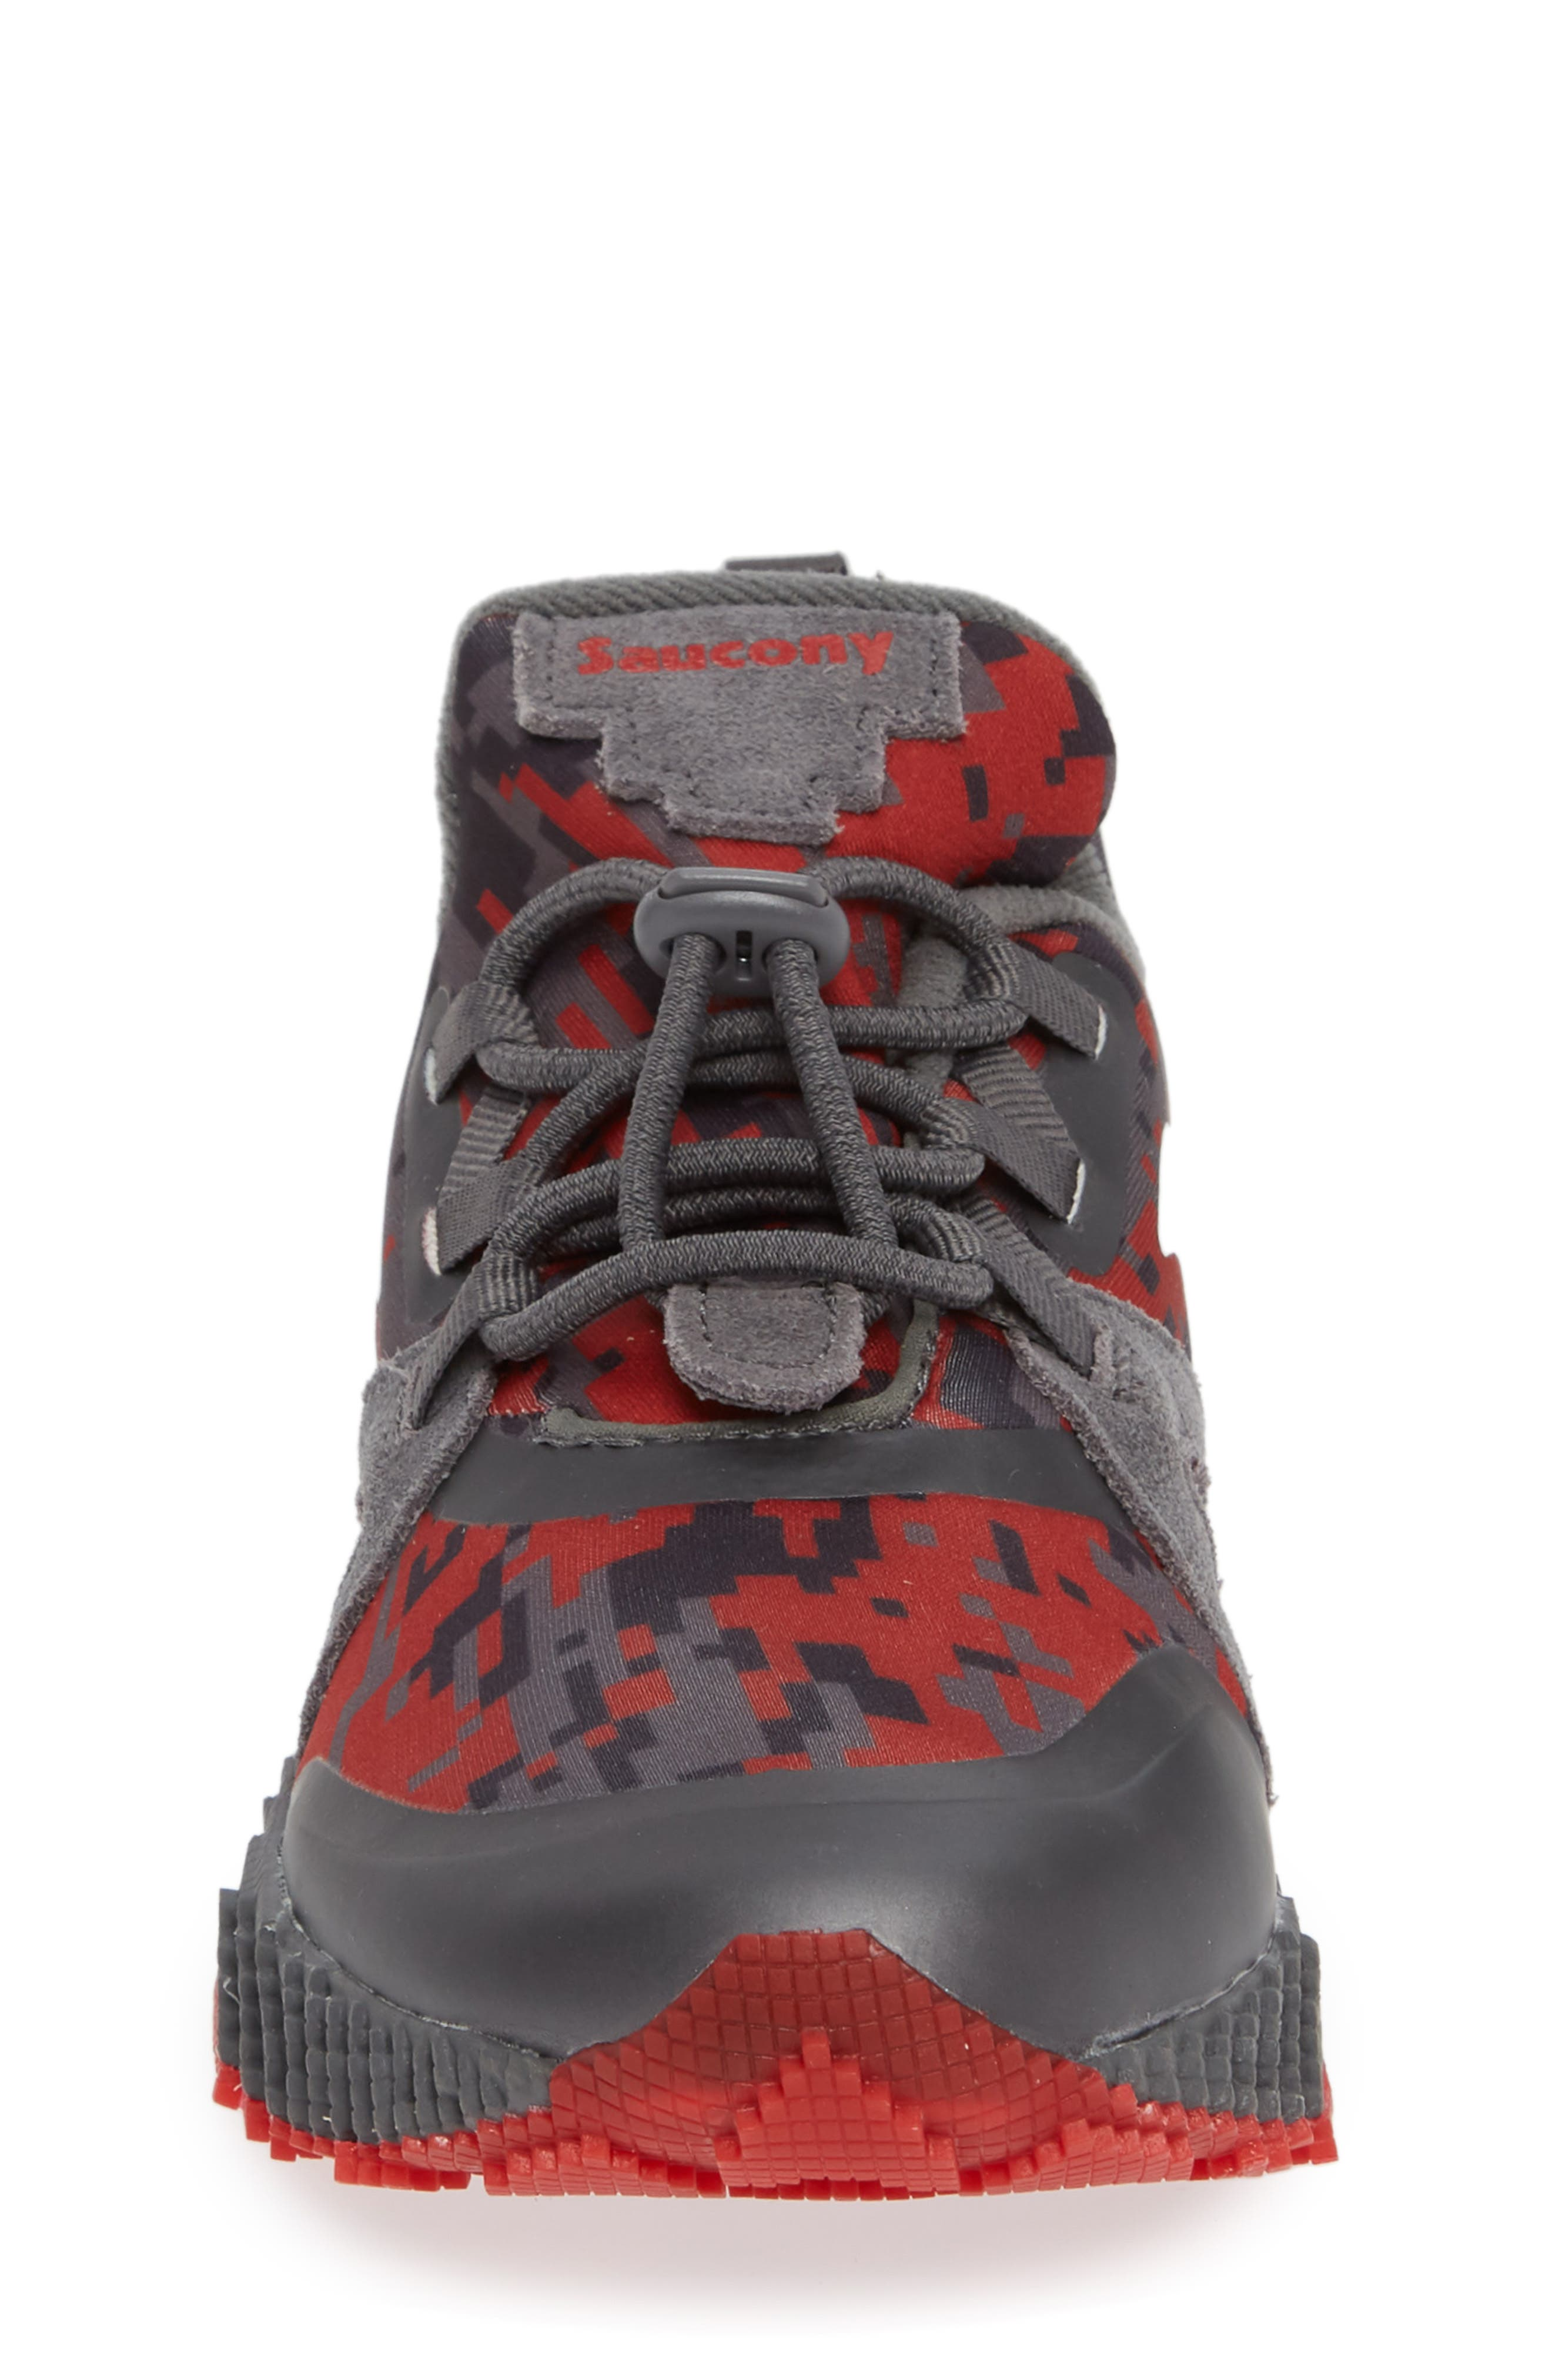 Voxel 9000 Sneaker,                             Alternate thumbnail 4, color,                             GREY LEATHER/ MESH 2